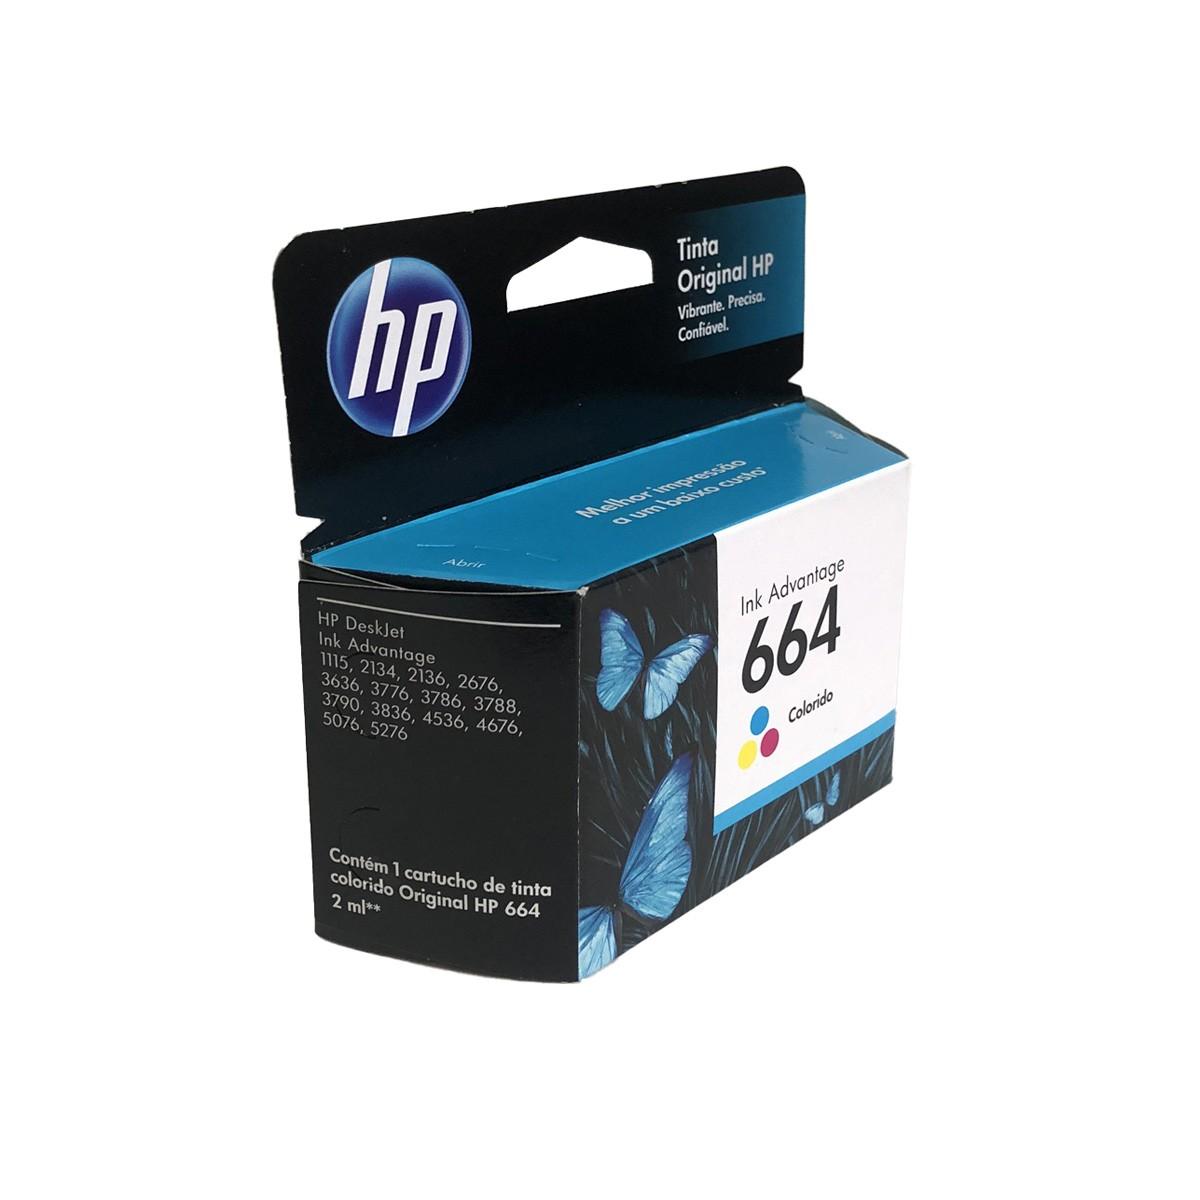 Cartucho HP 664 F6V28AB Colorido 2ml para 1115 2136 3636 3836 4536 4676